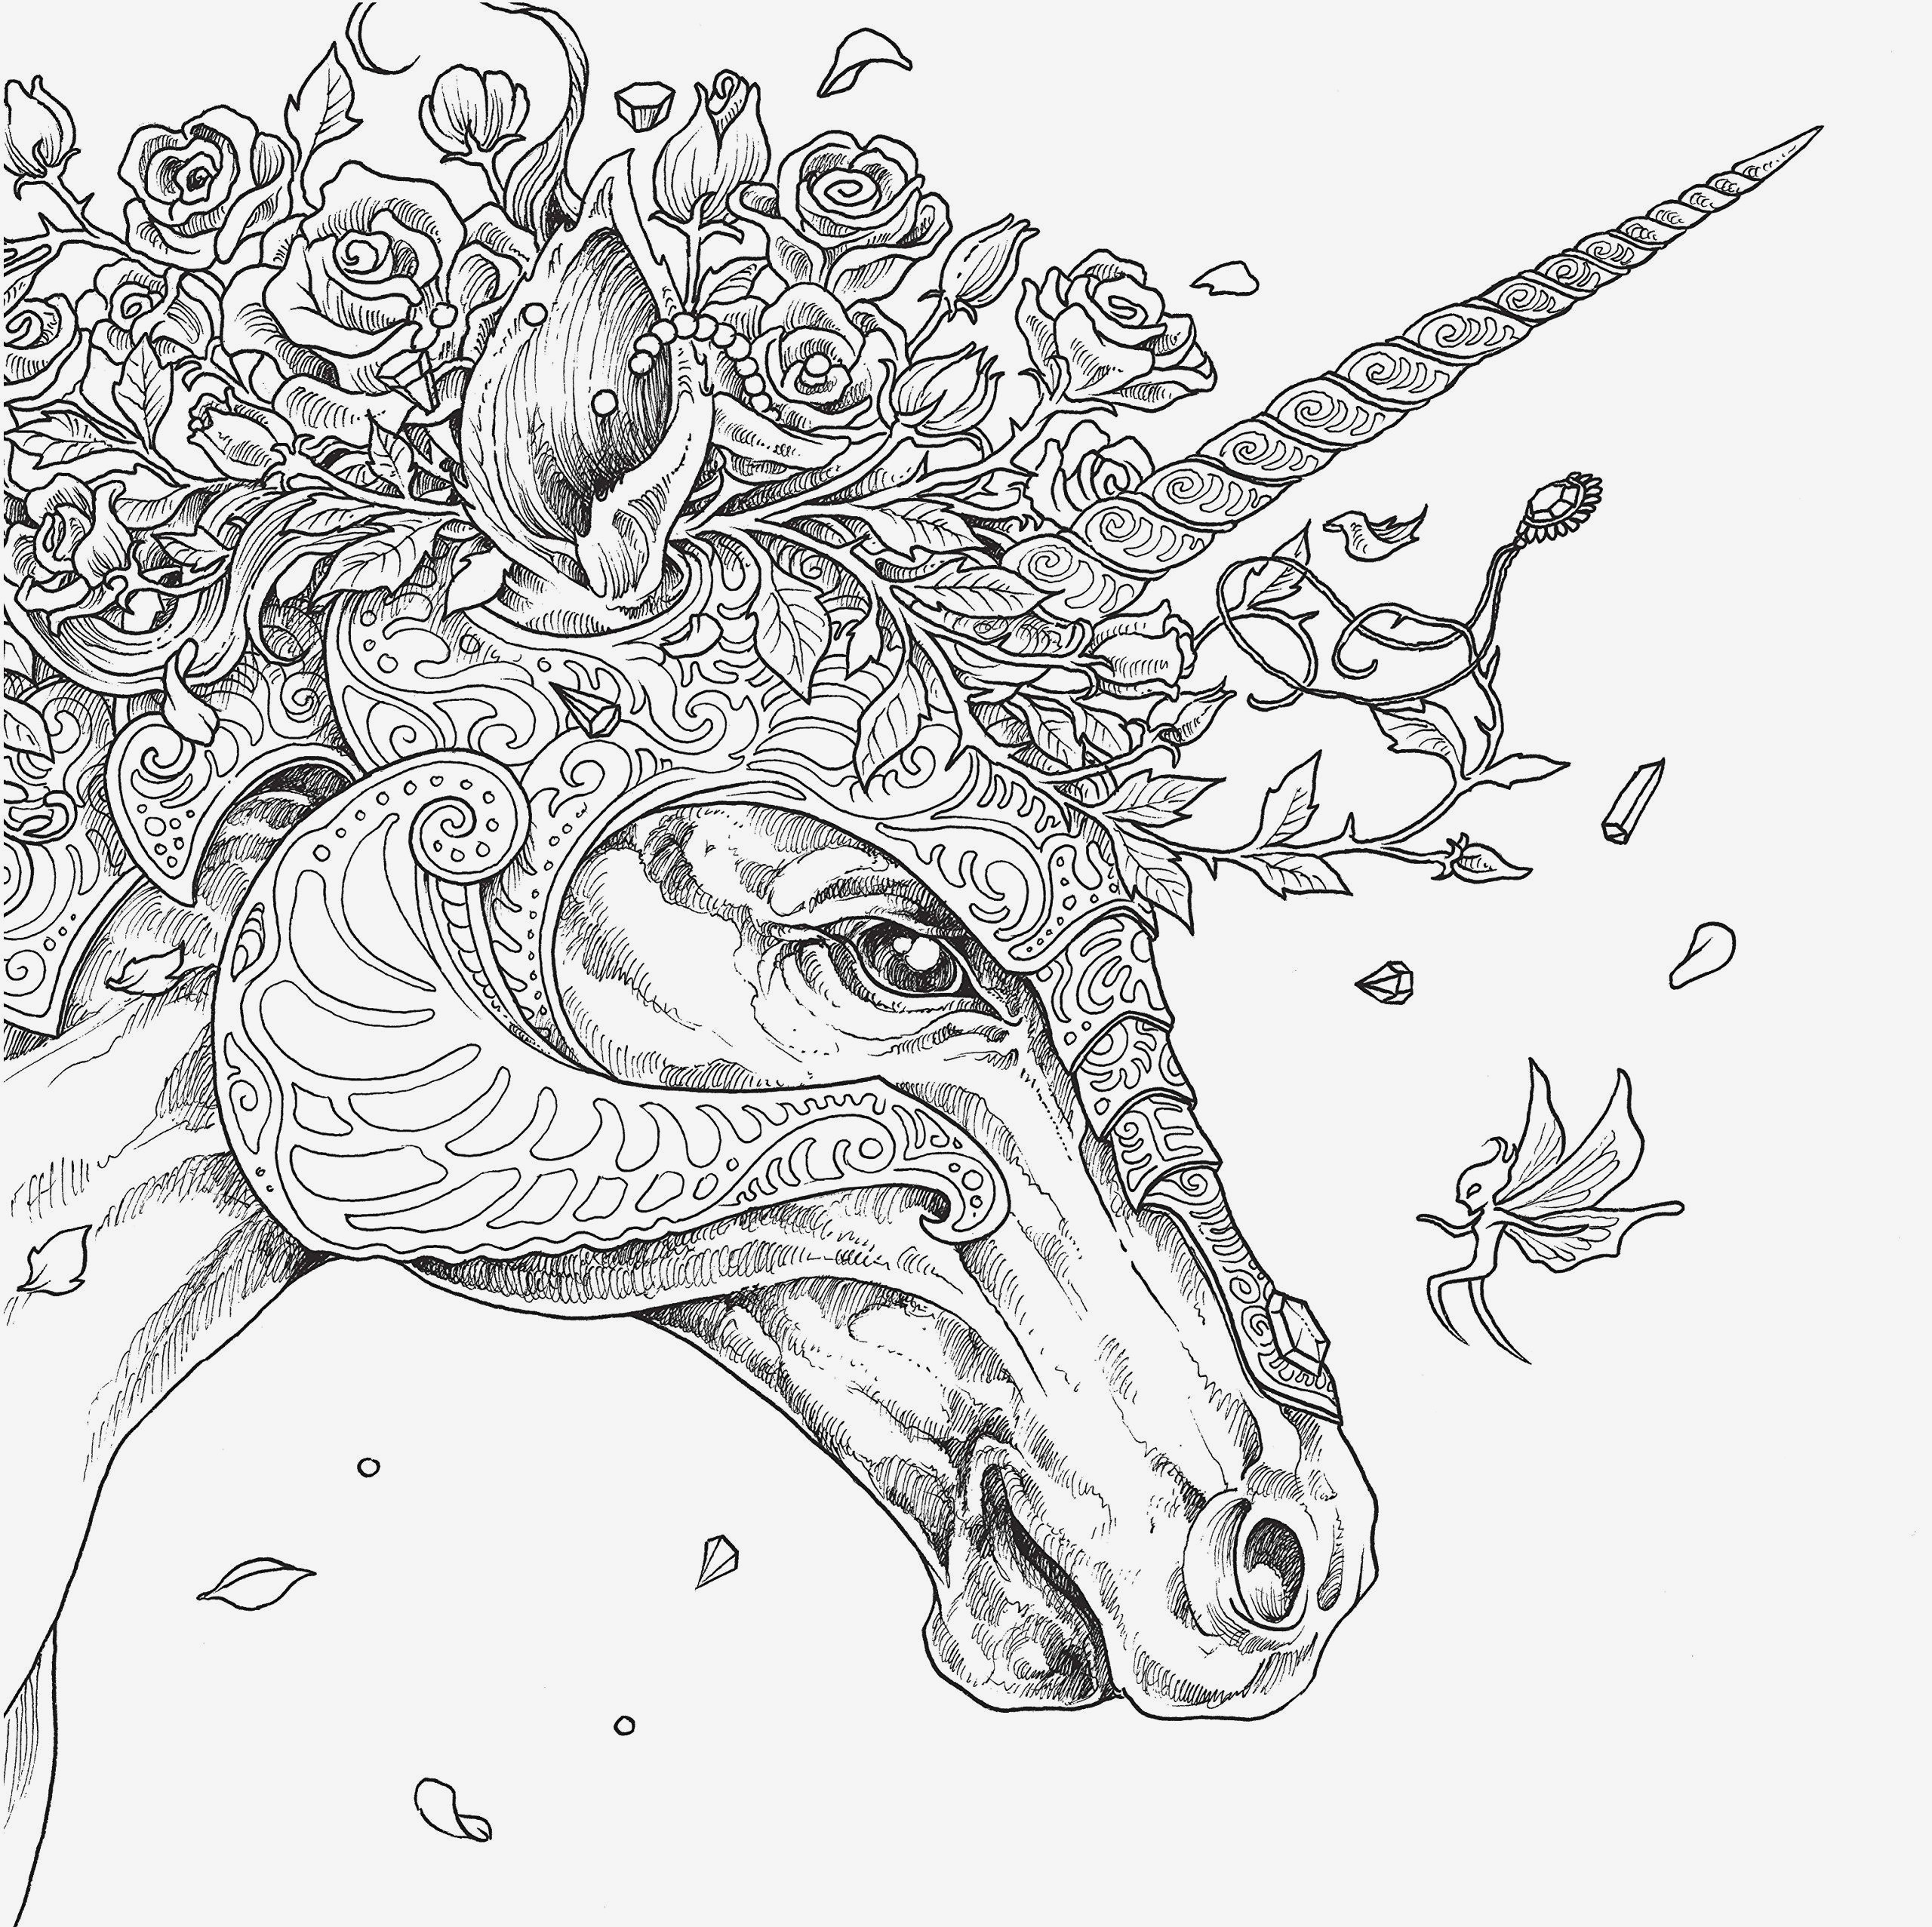 Ausmalbilder My Little Pony Equestria Das Beste Von 50 Frisch Ausmalbilder My Little Ponys Beste Malvorlage Stock